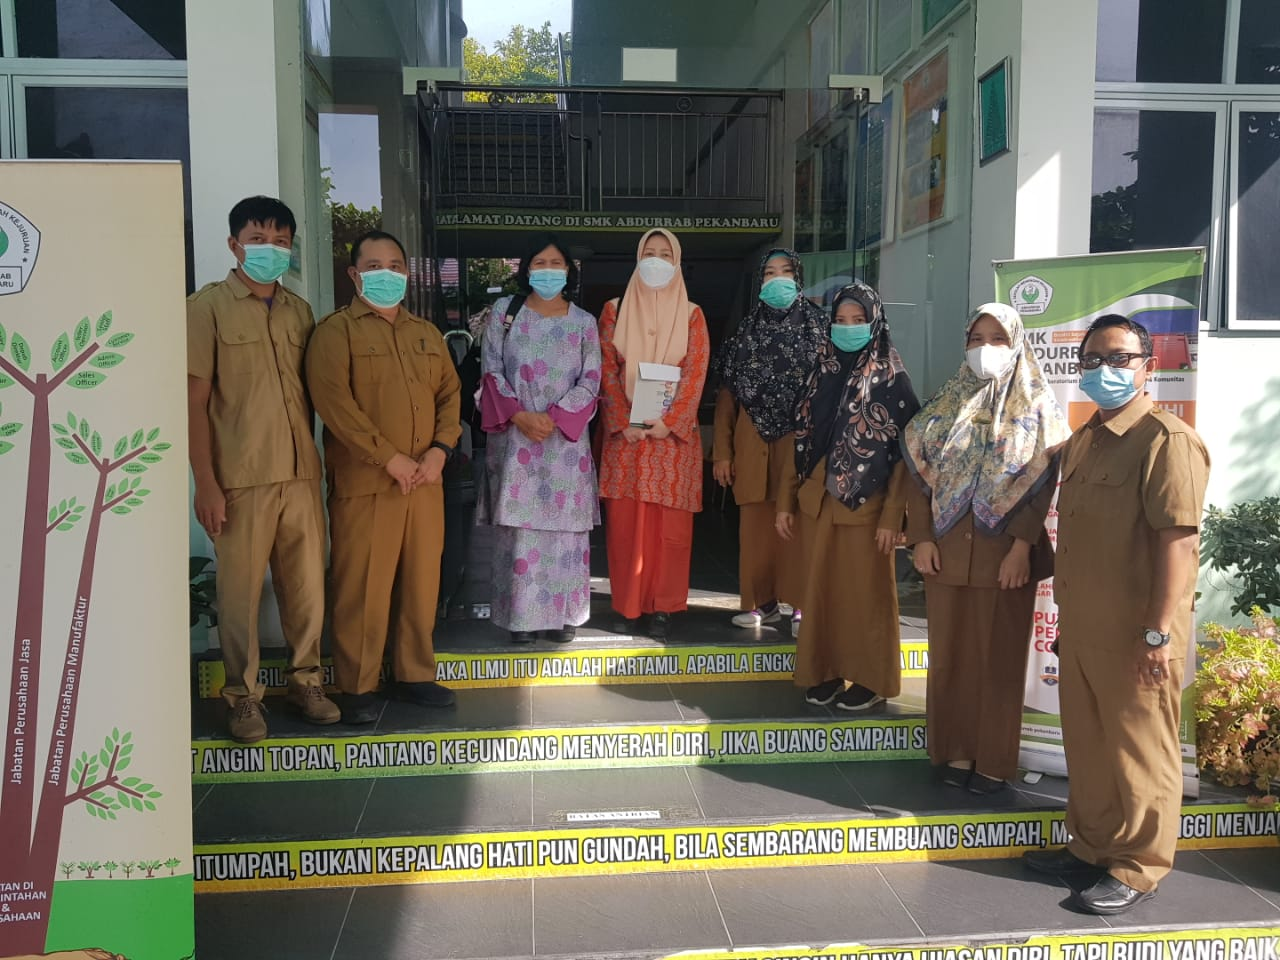 285-kunjungan-juri-adiwiyata-prov-riau-ke-smk-abdurrab-pekanbaru